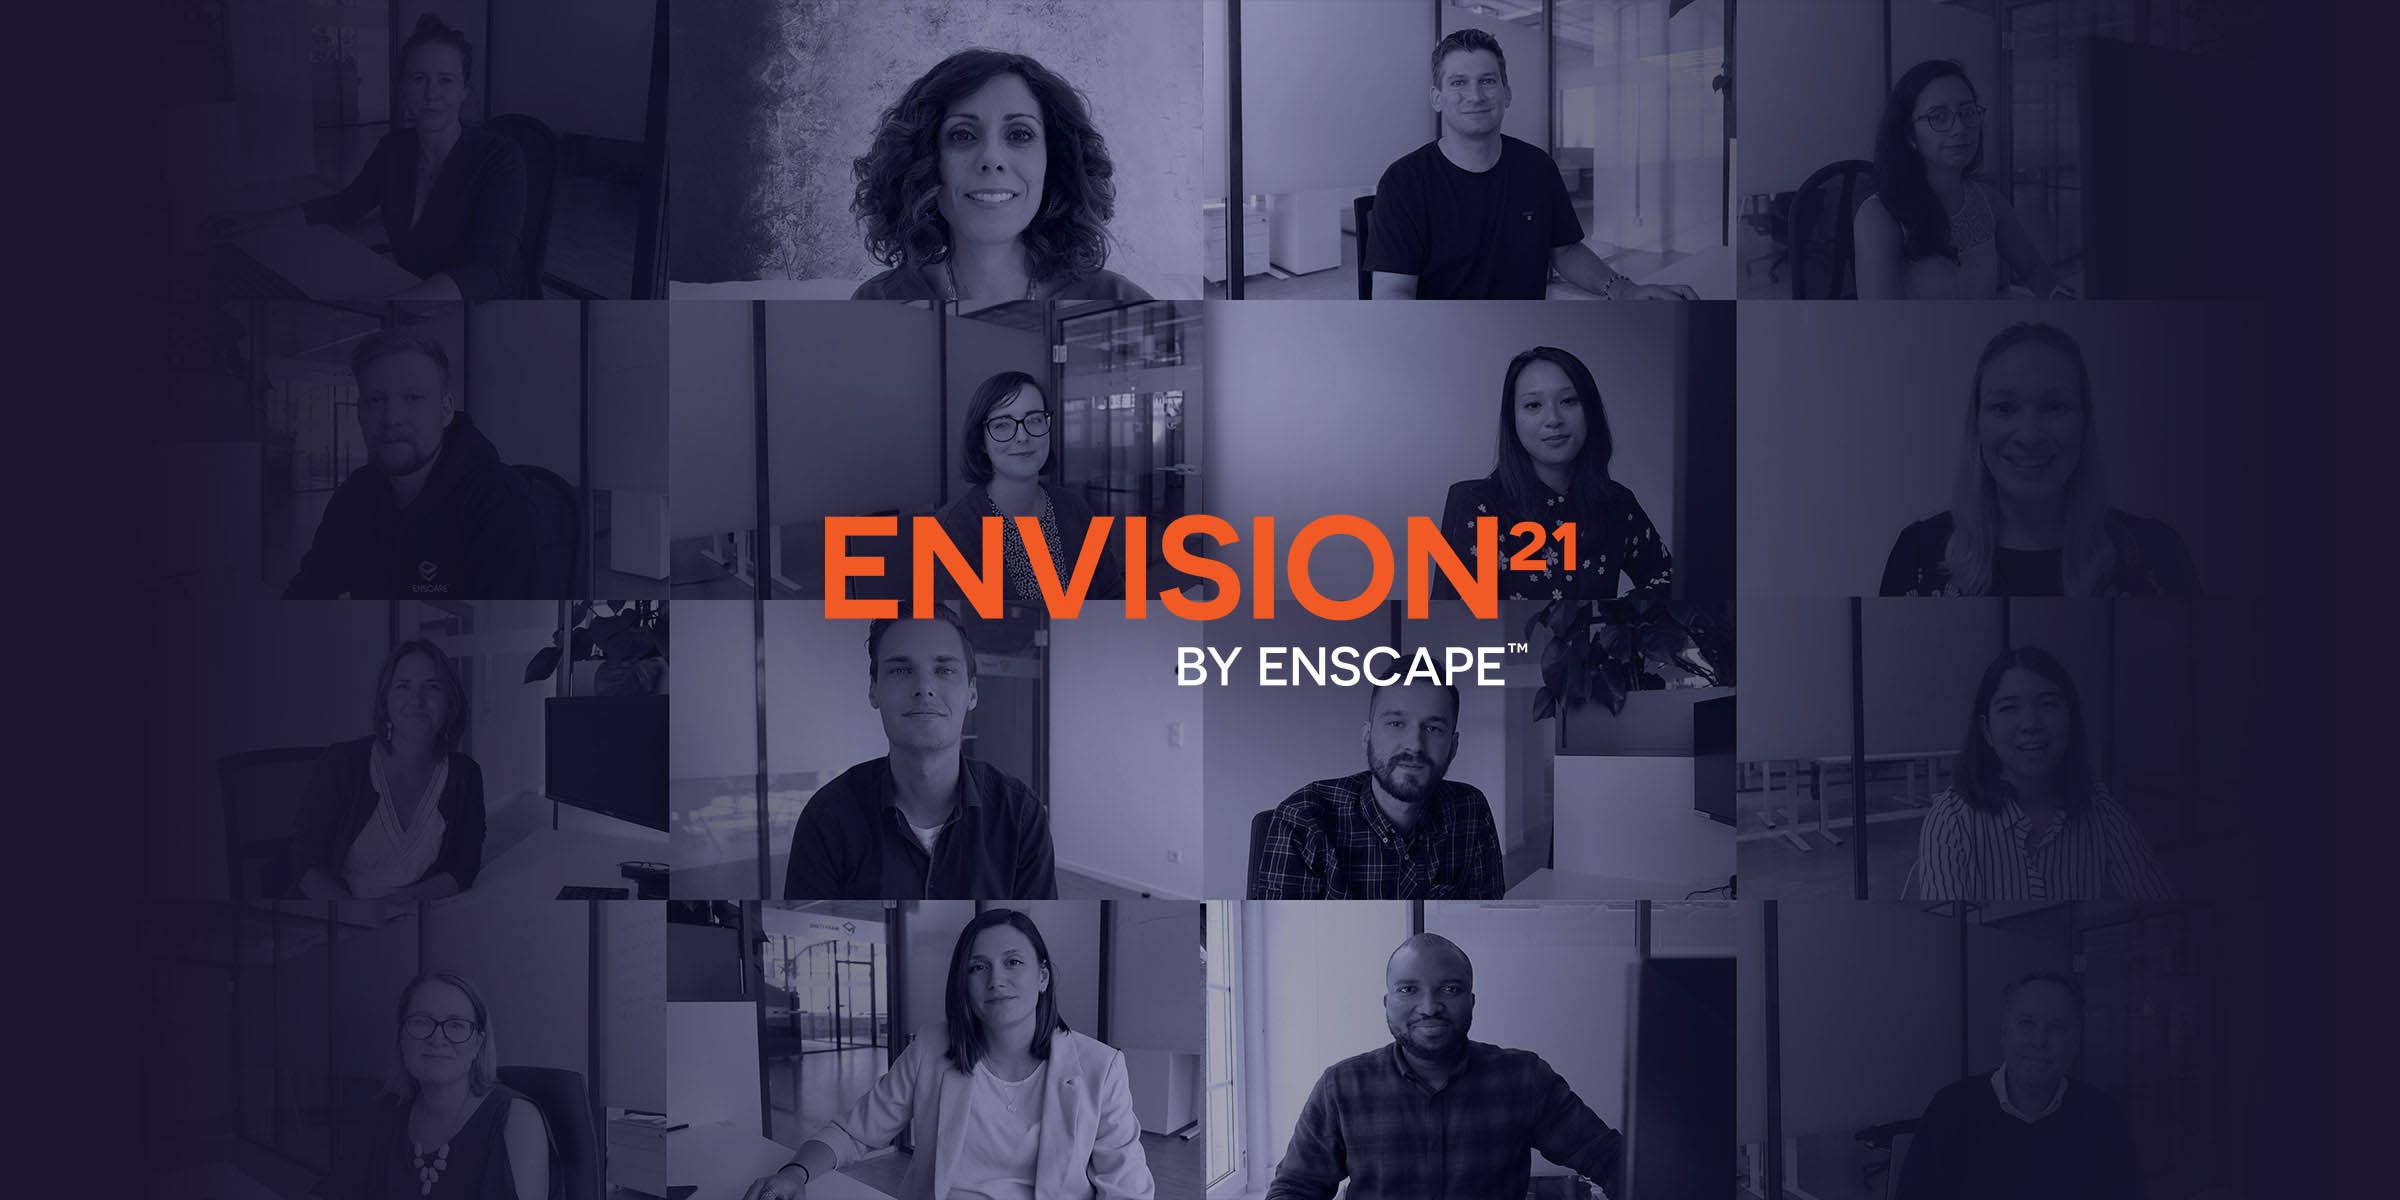 ENVISION highlights